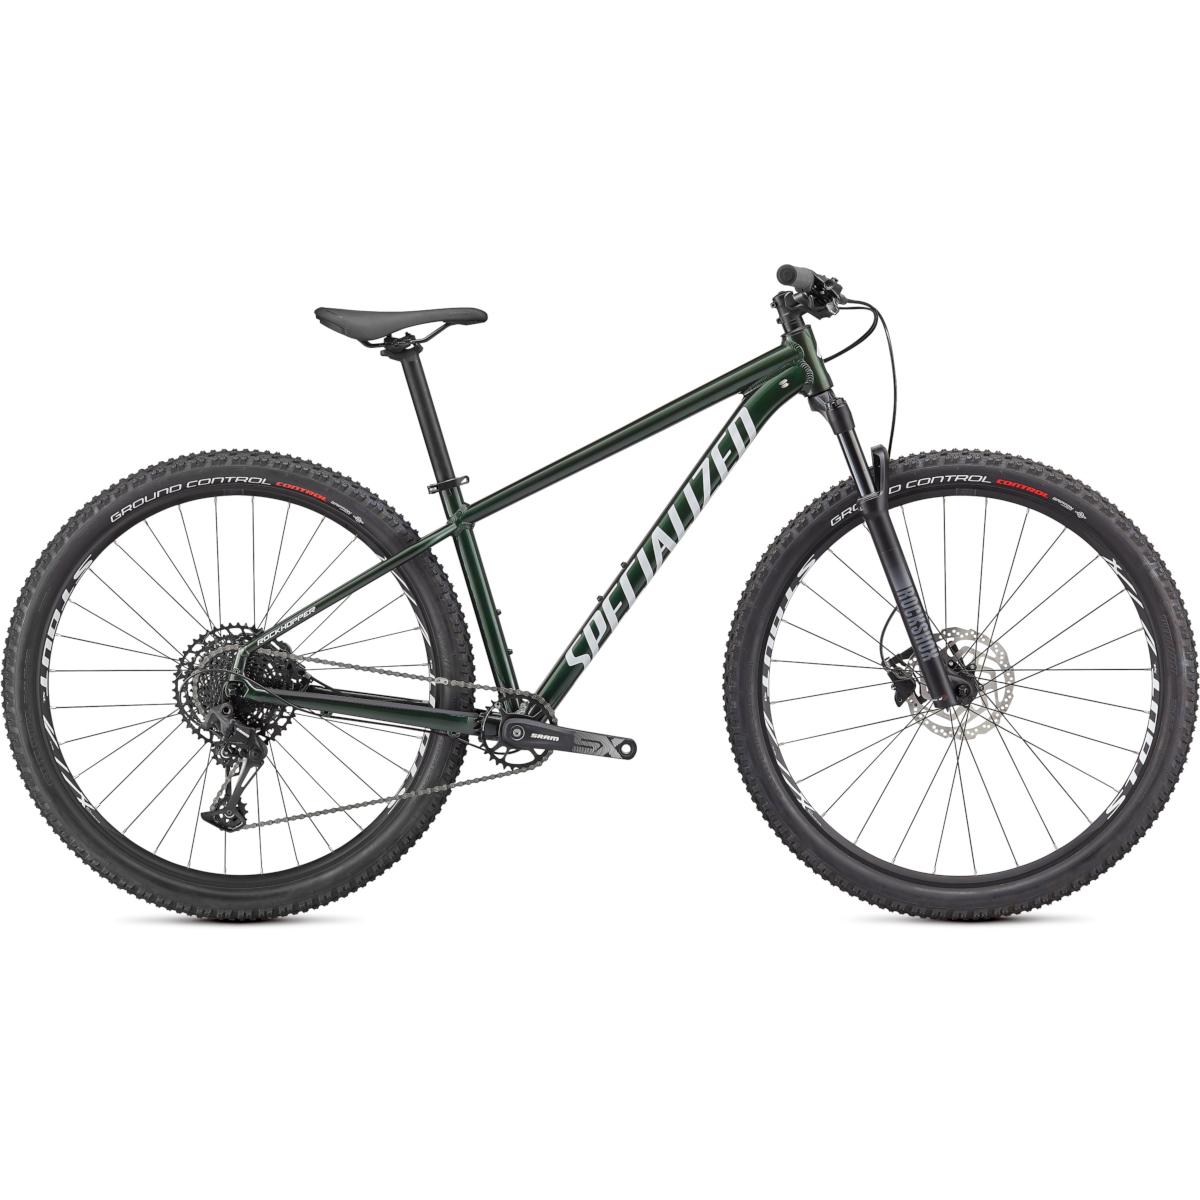 "Specialized ROCKHOPPER EXPERT - 29"" Bicicleta de montaña - 2021 - gloss oak green metallic / metallic white silver"